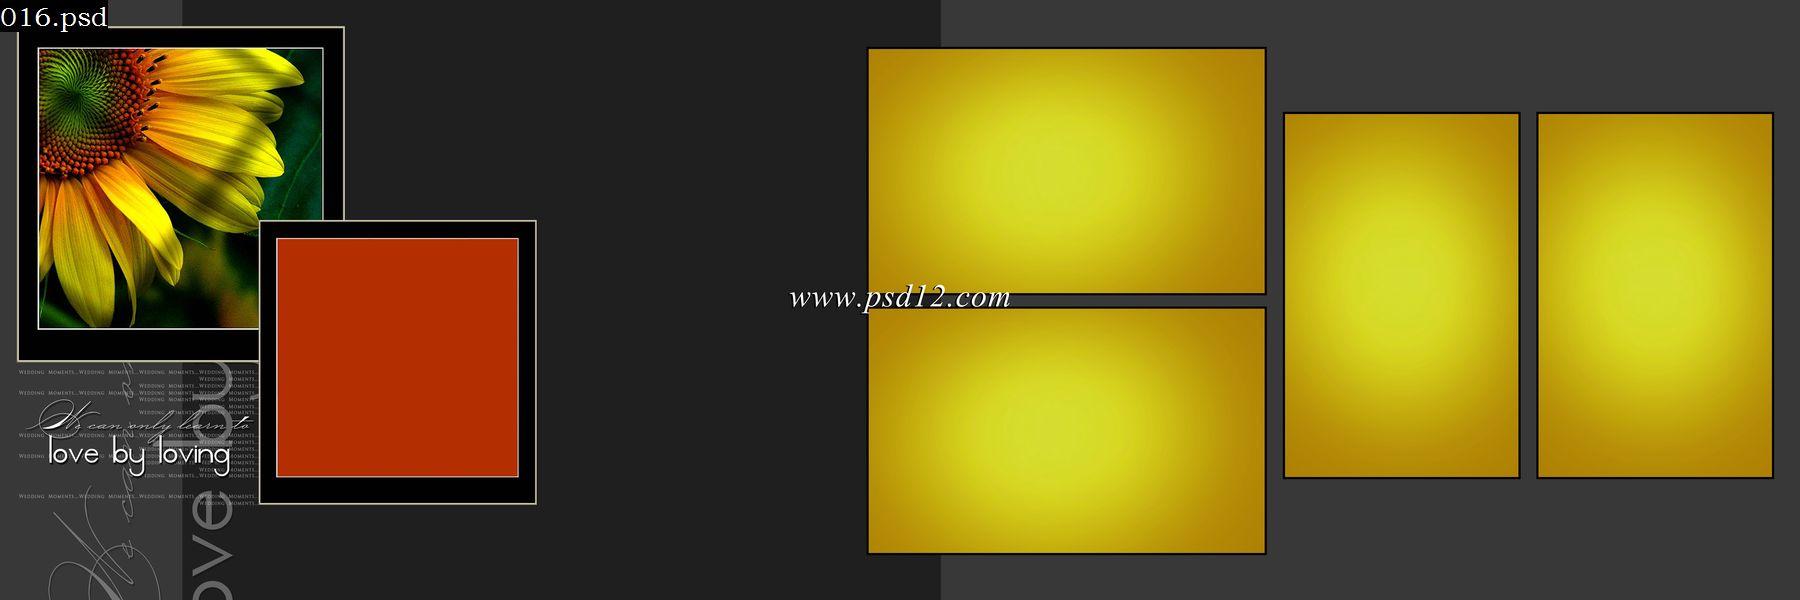 Karizma PSD File